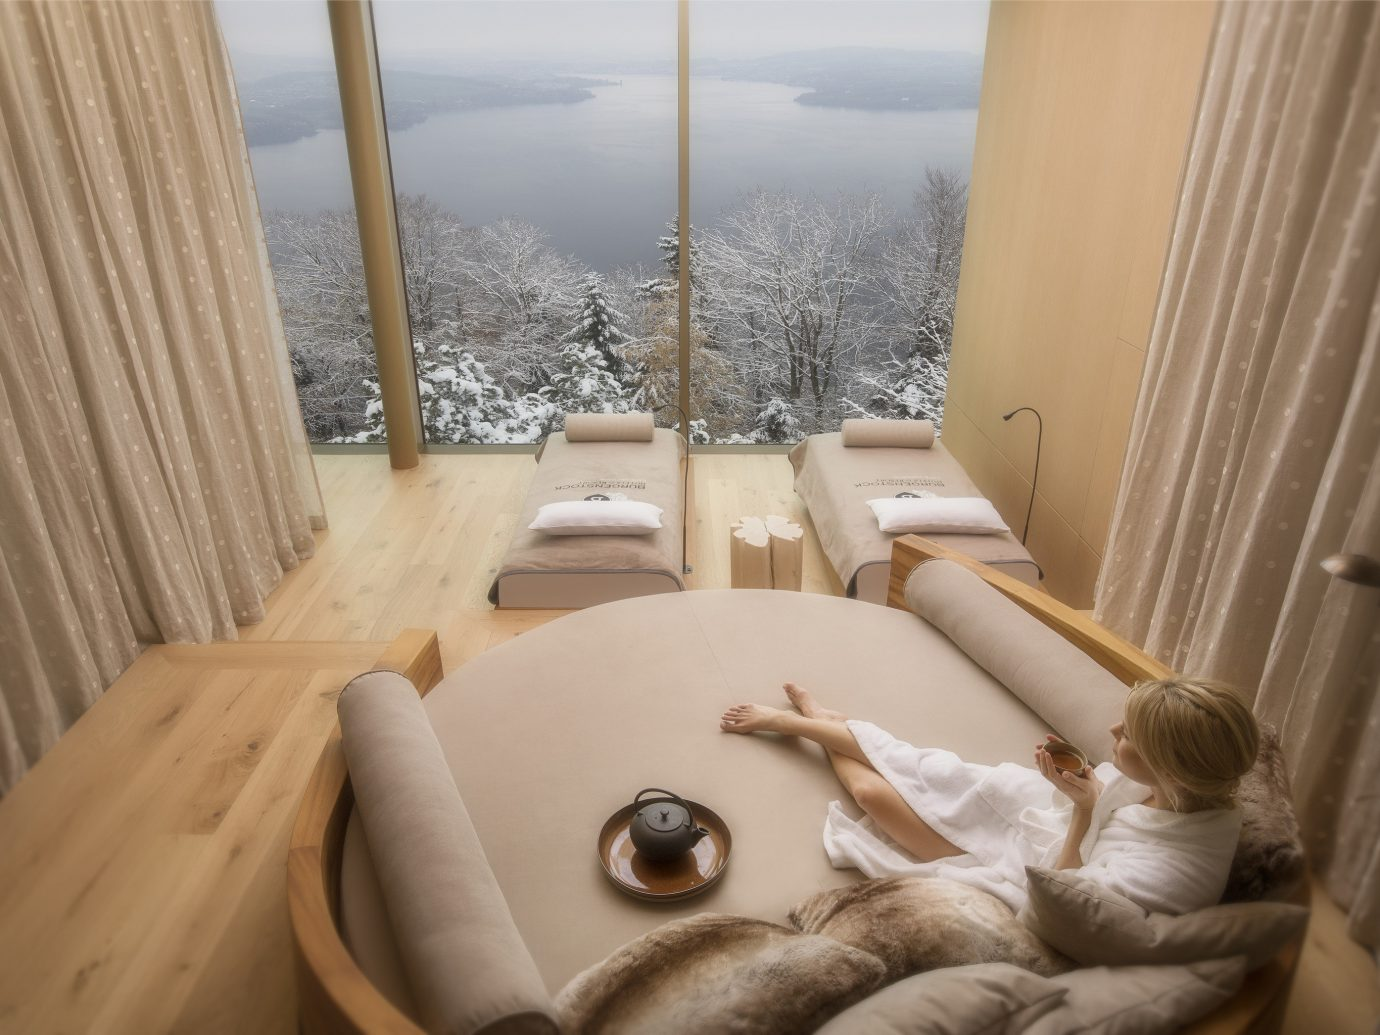 Boutique Hotels Hotels Luxury Travel room property bathtub Suite interior design window bathroom bed